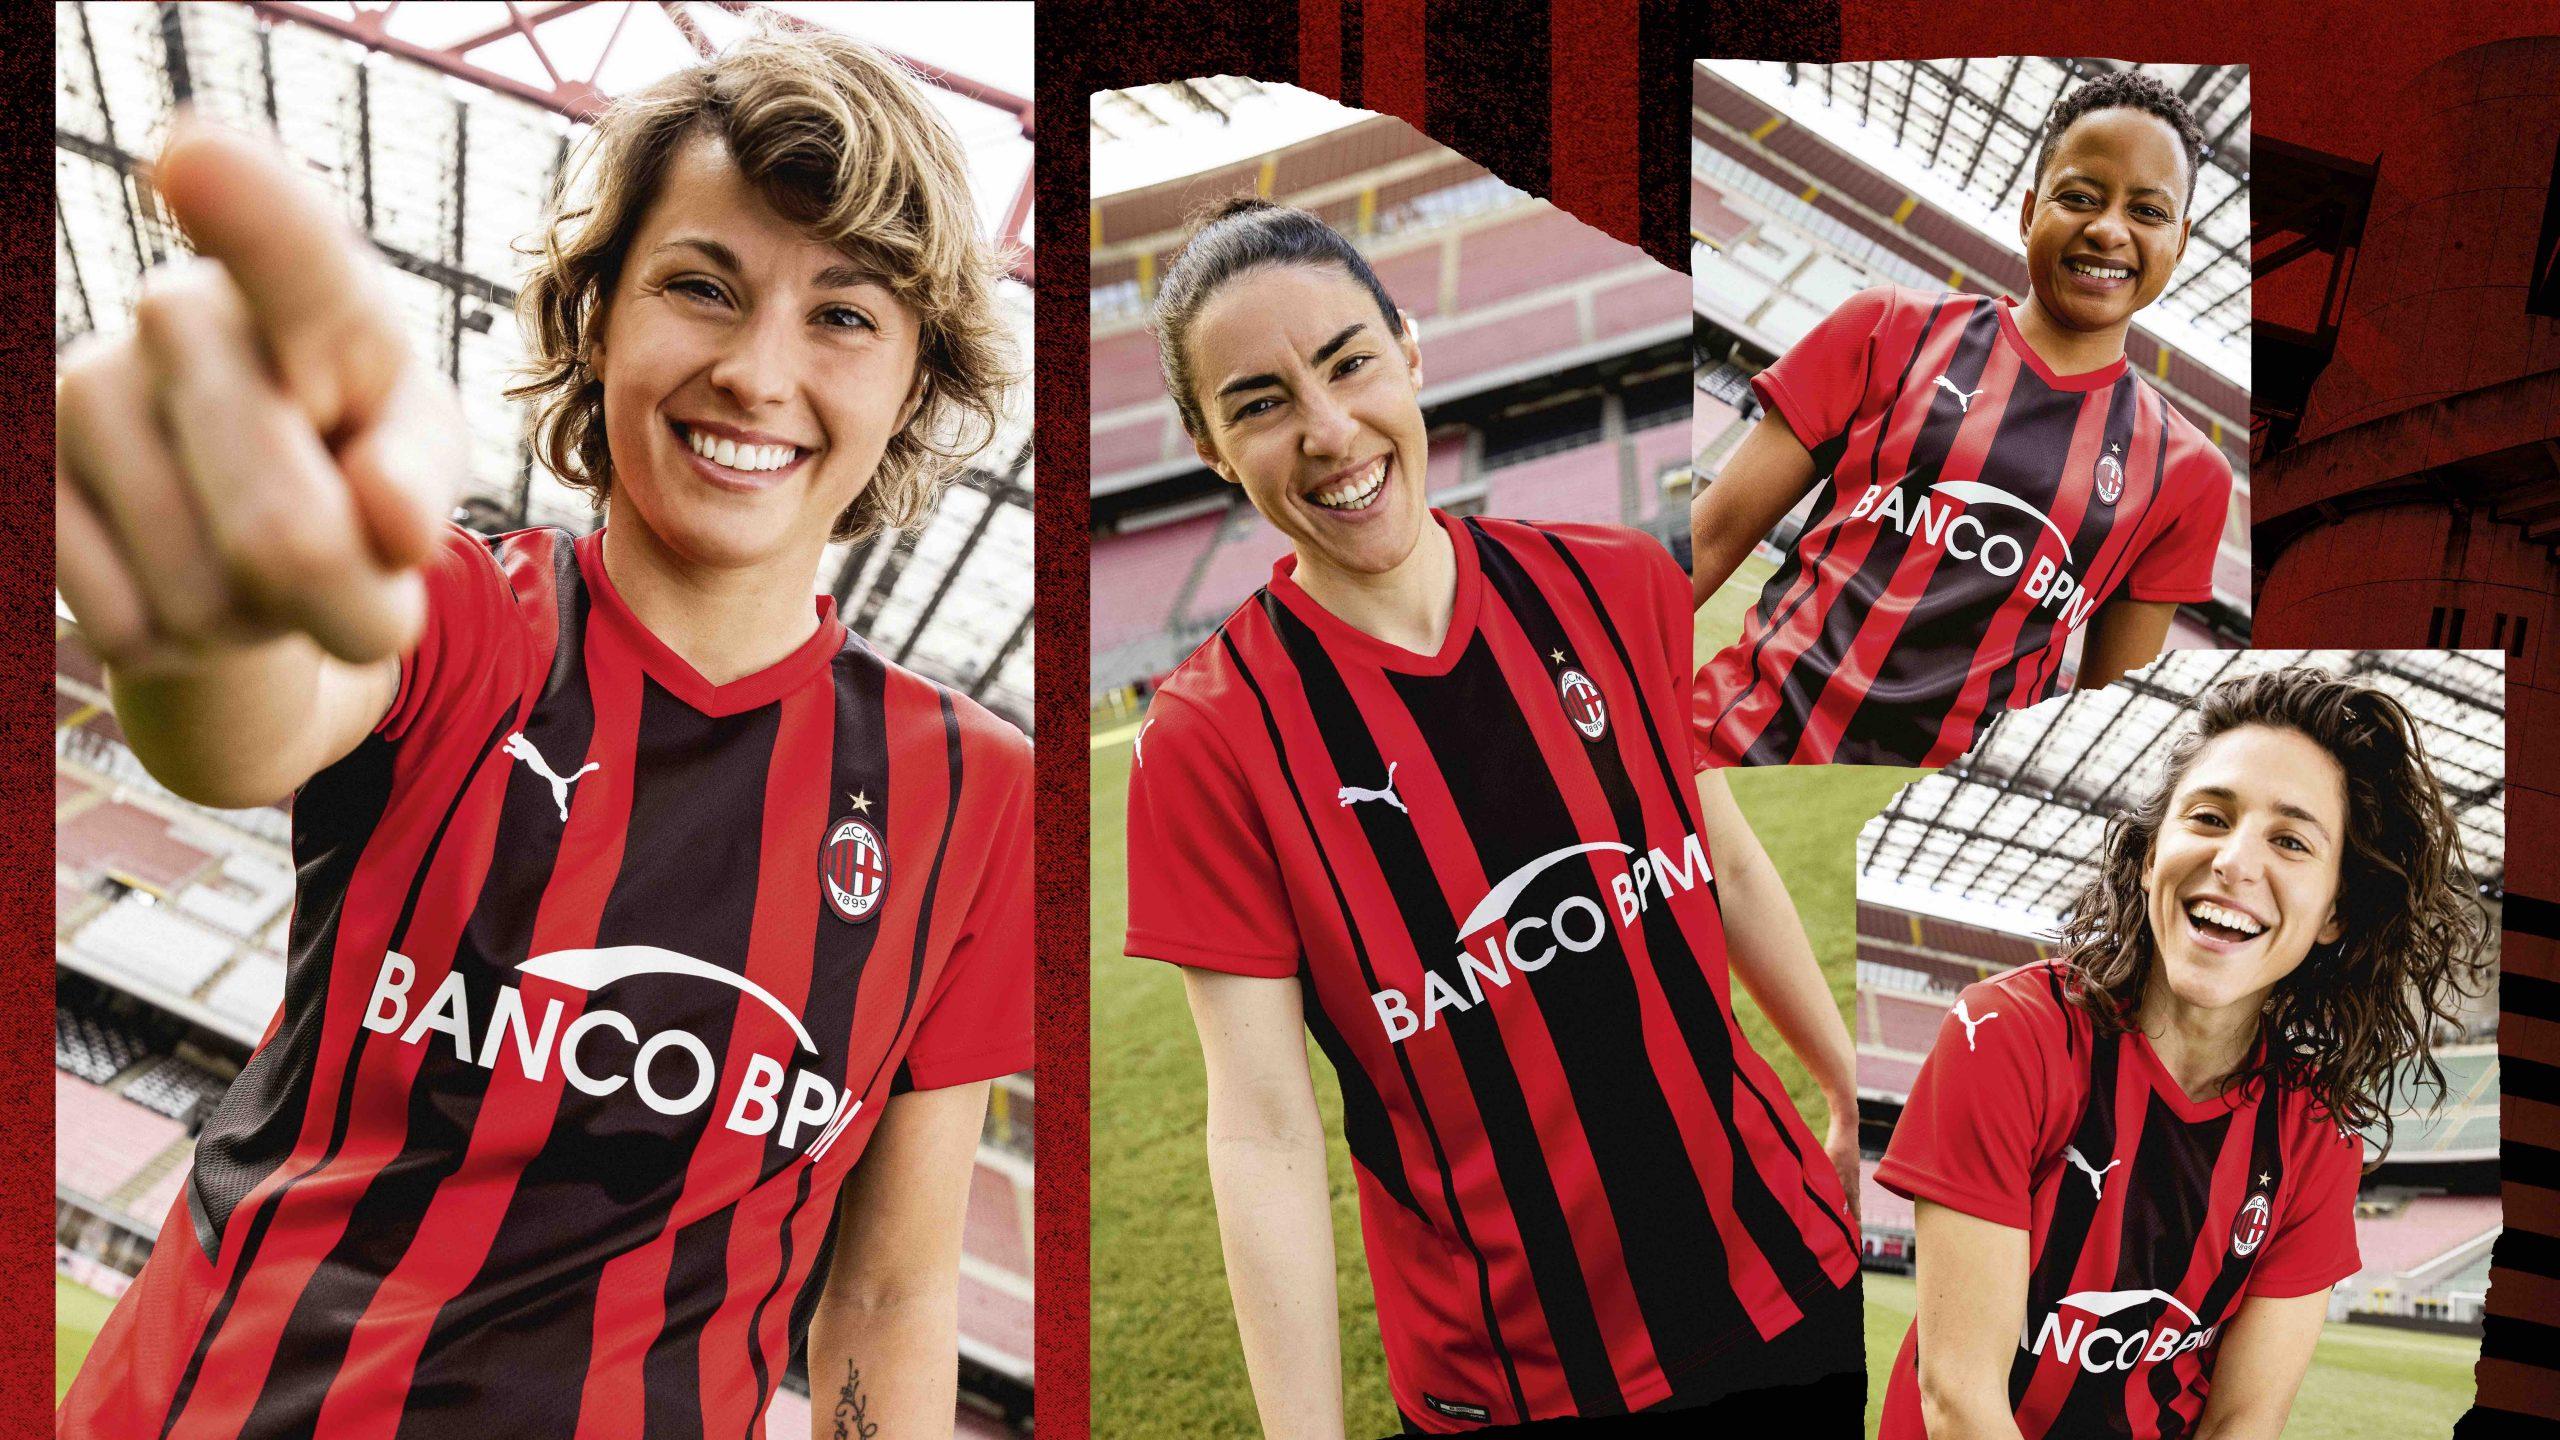 21AW_TS_PR_Football_AC-Milan_Home_1920x1080px_4[1][1]